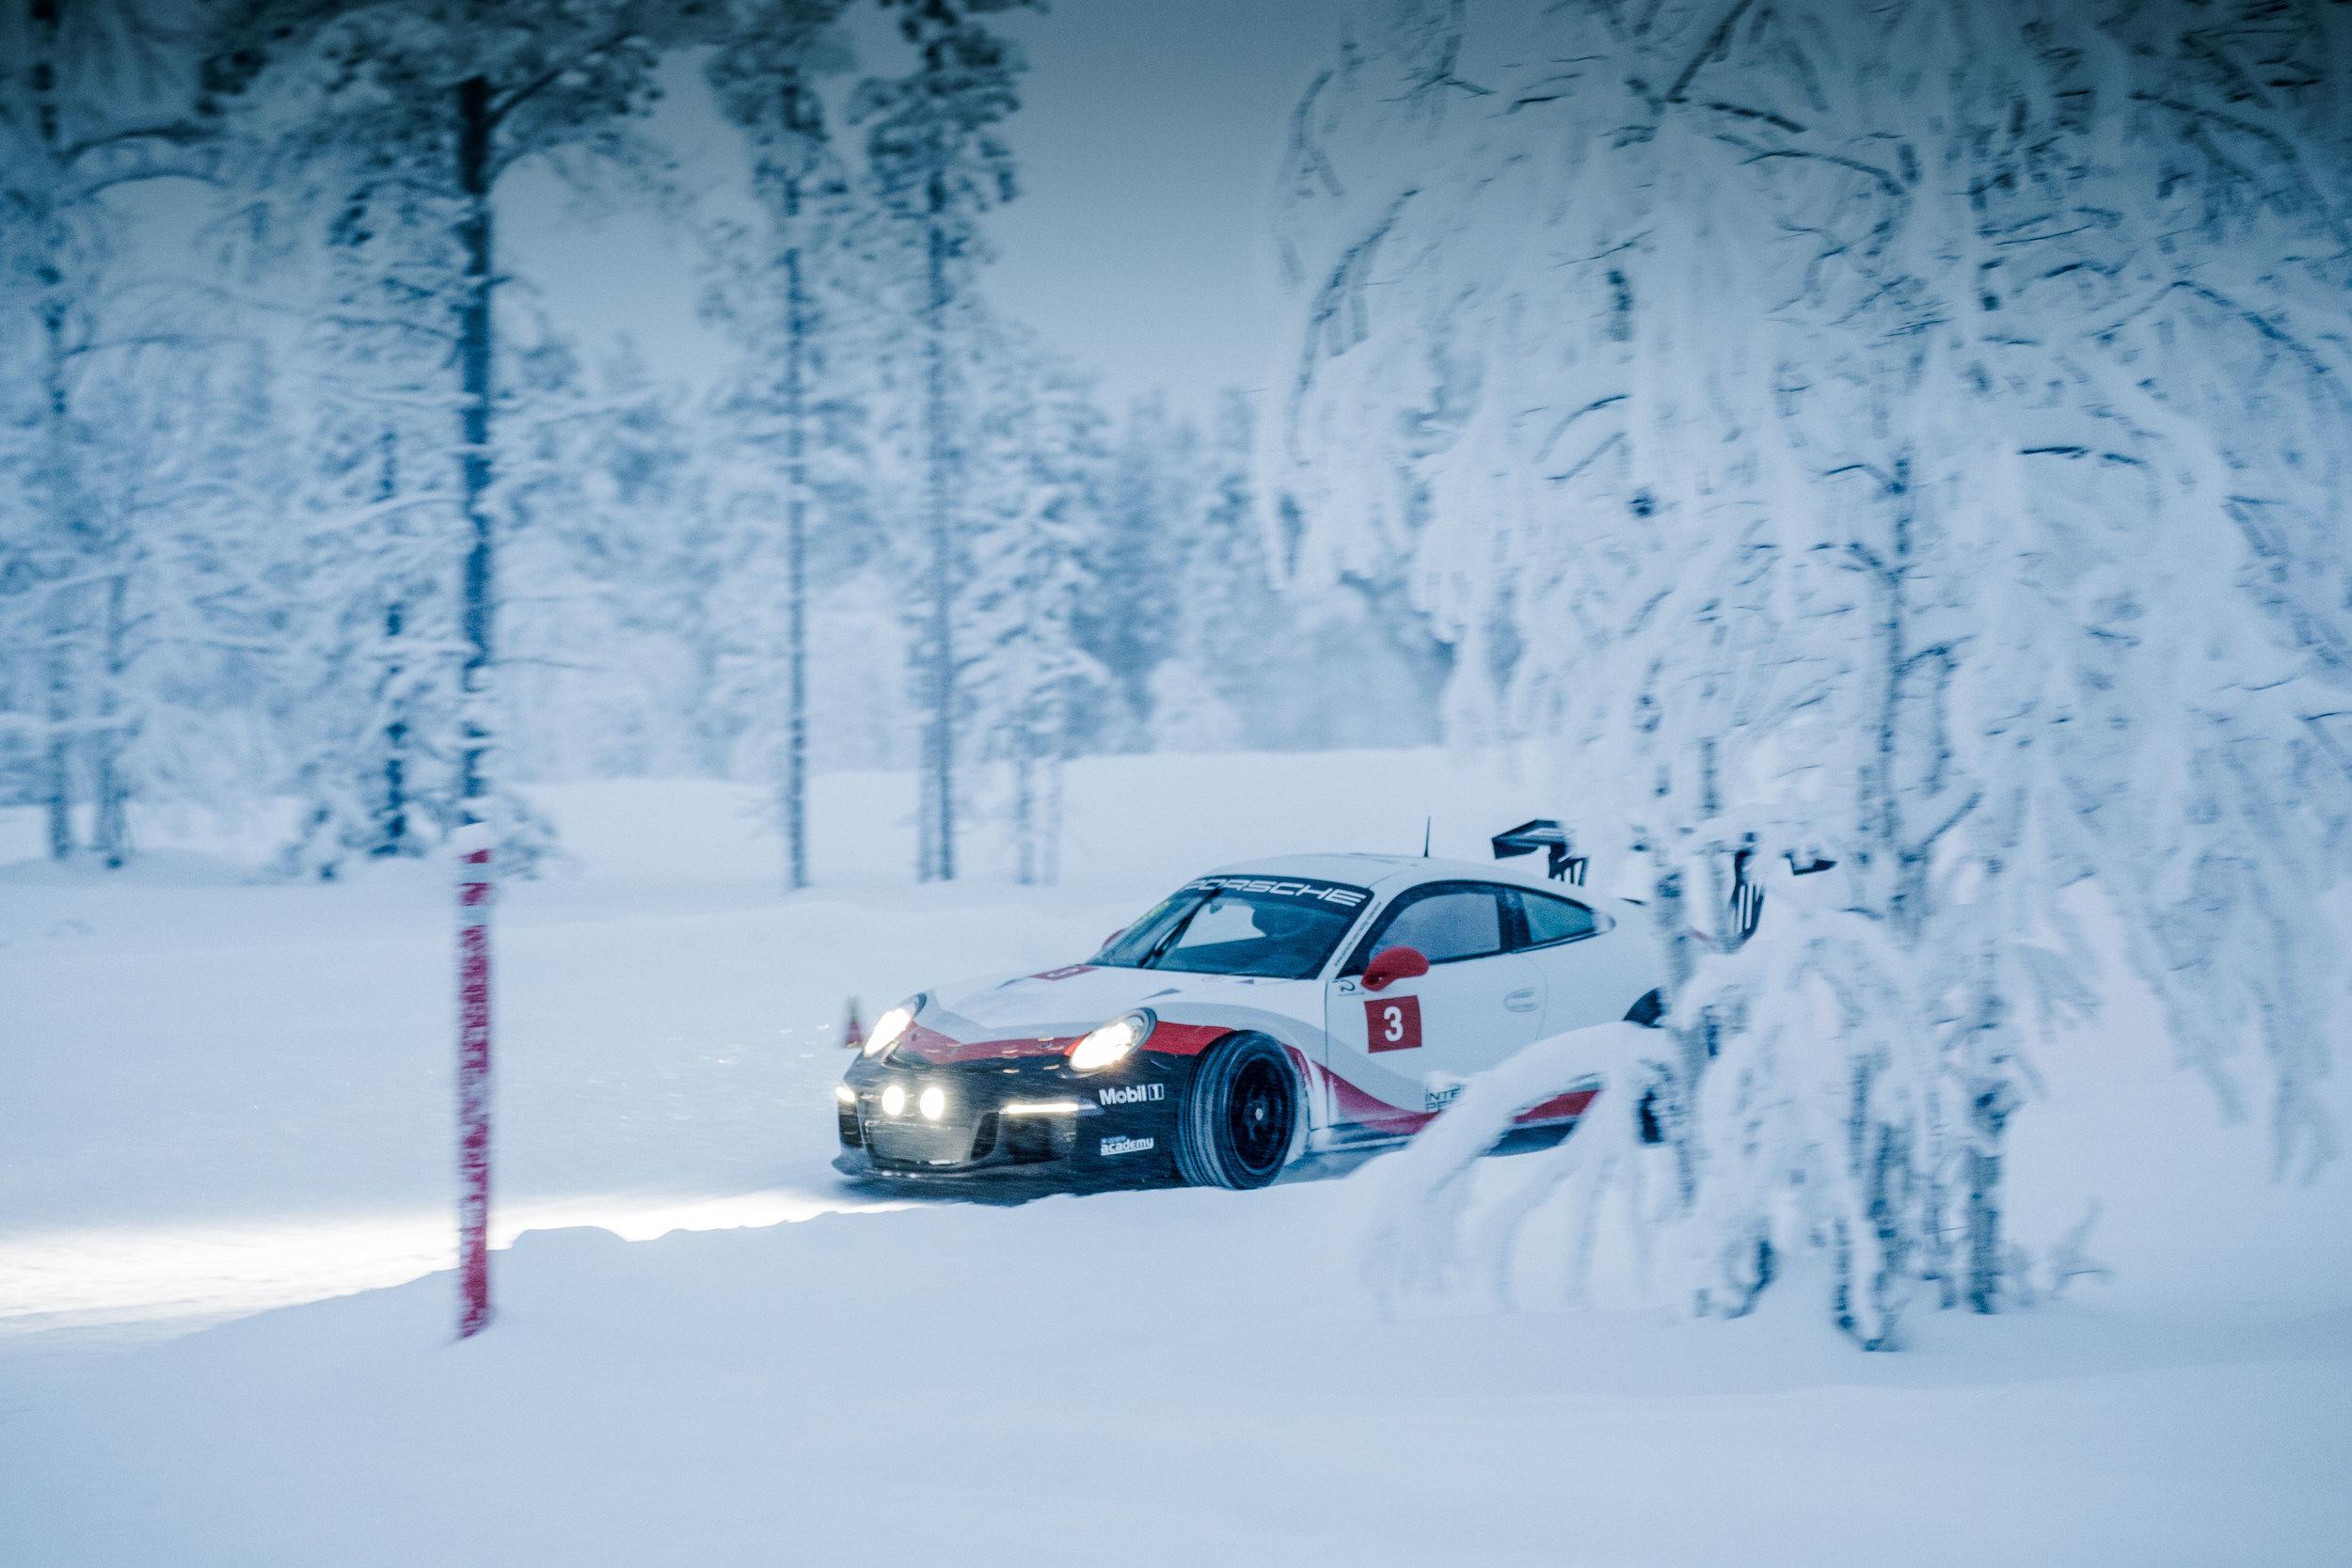 Porsche Ice Experience on Ice_30_01_2019_0210_175637.jpg